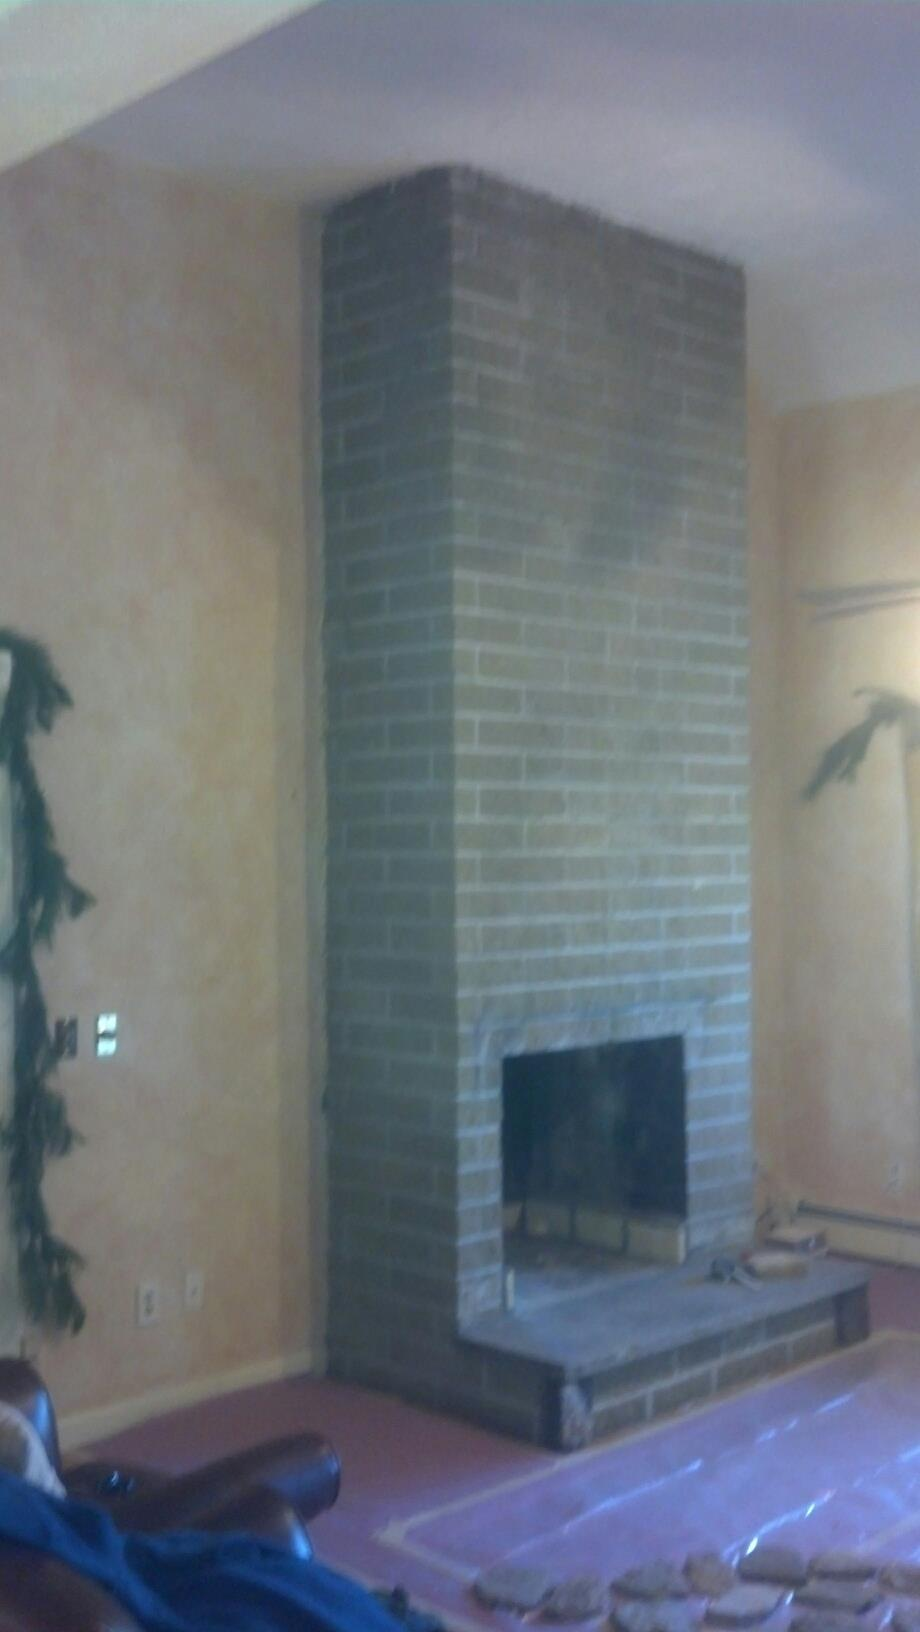 hotelhilrocom grate sweeping trap fireplace ds storrs vestal services dump dm caddy professional door chimney signed ash